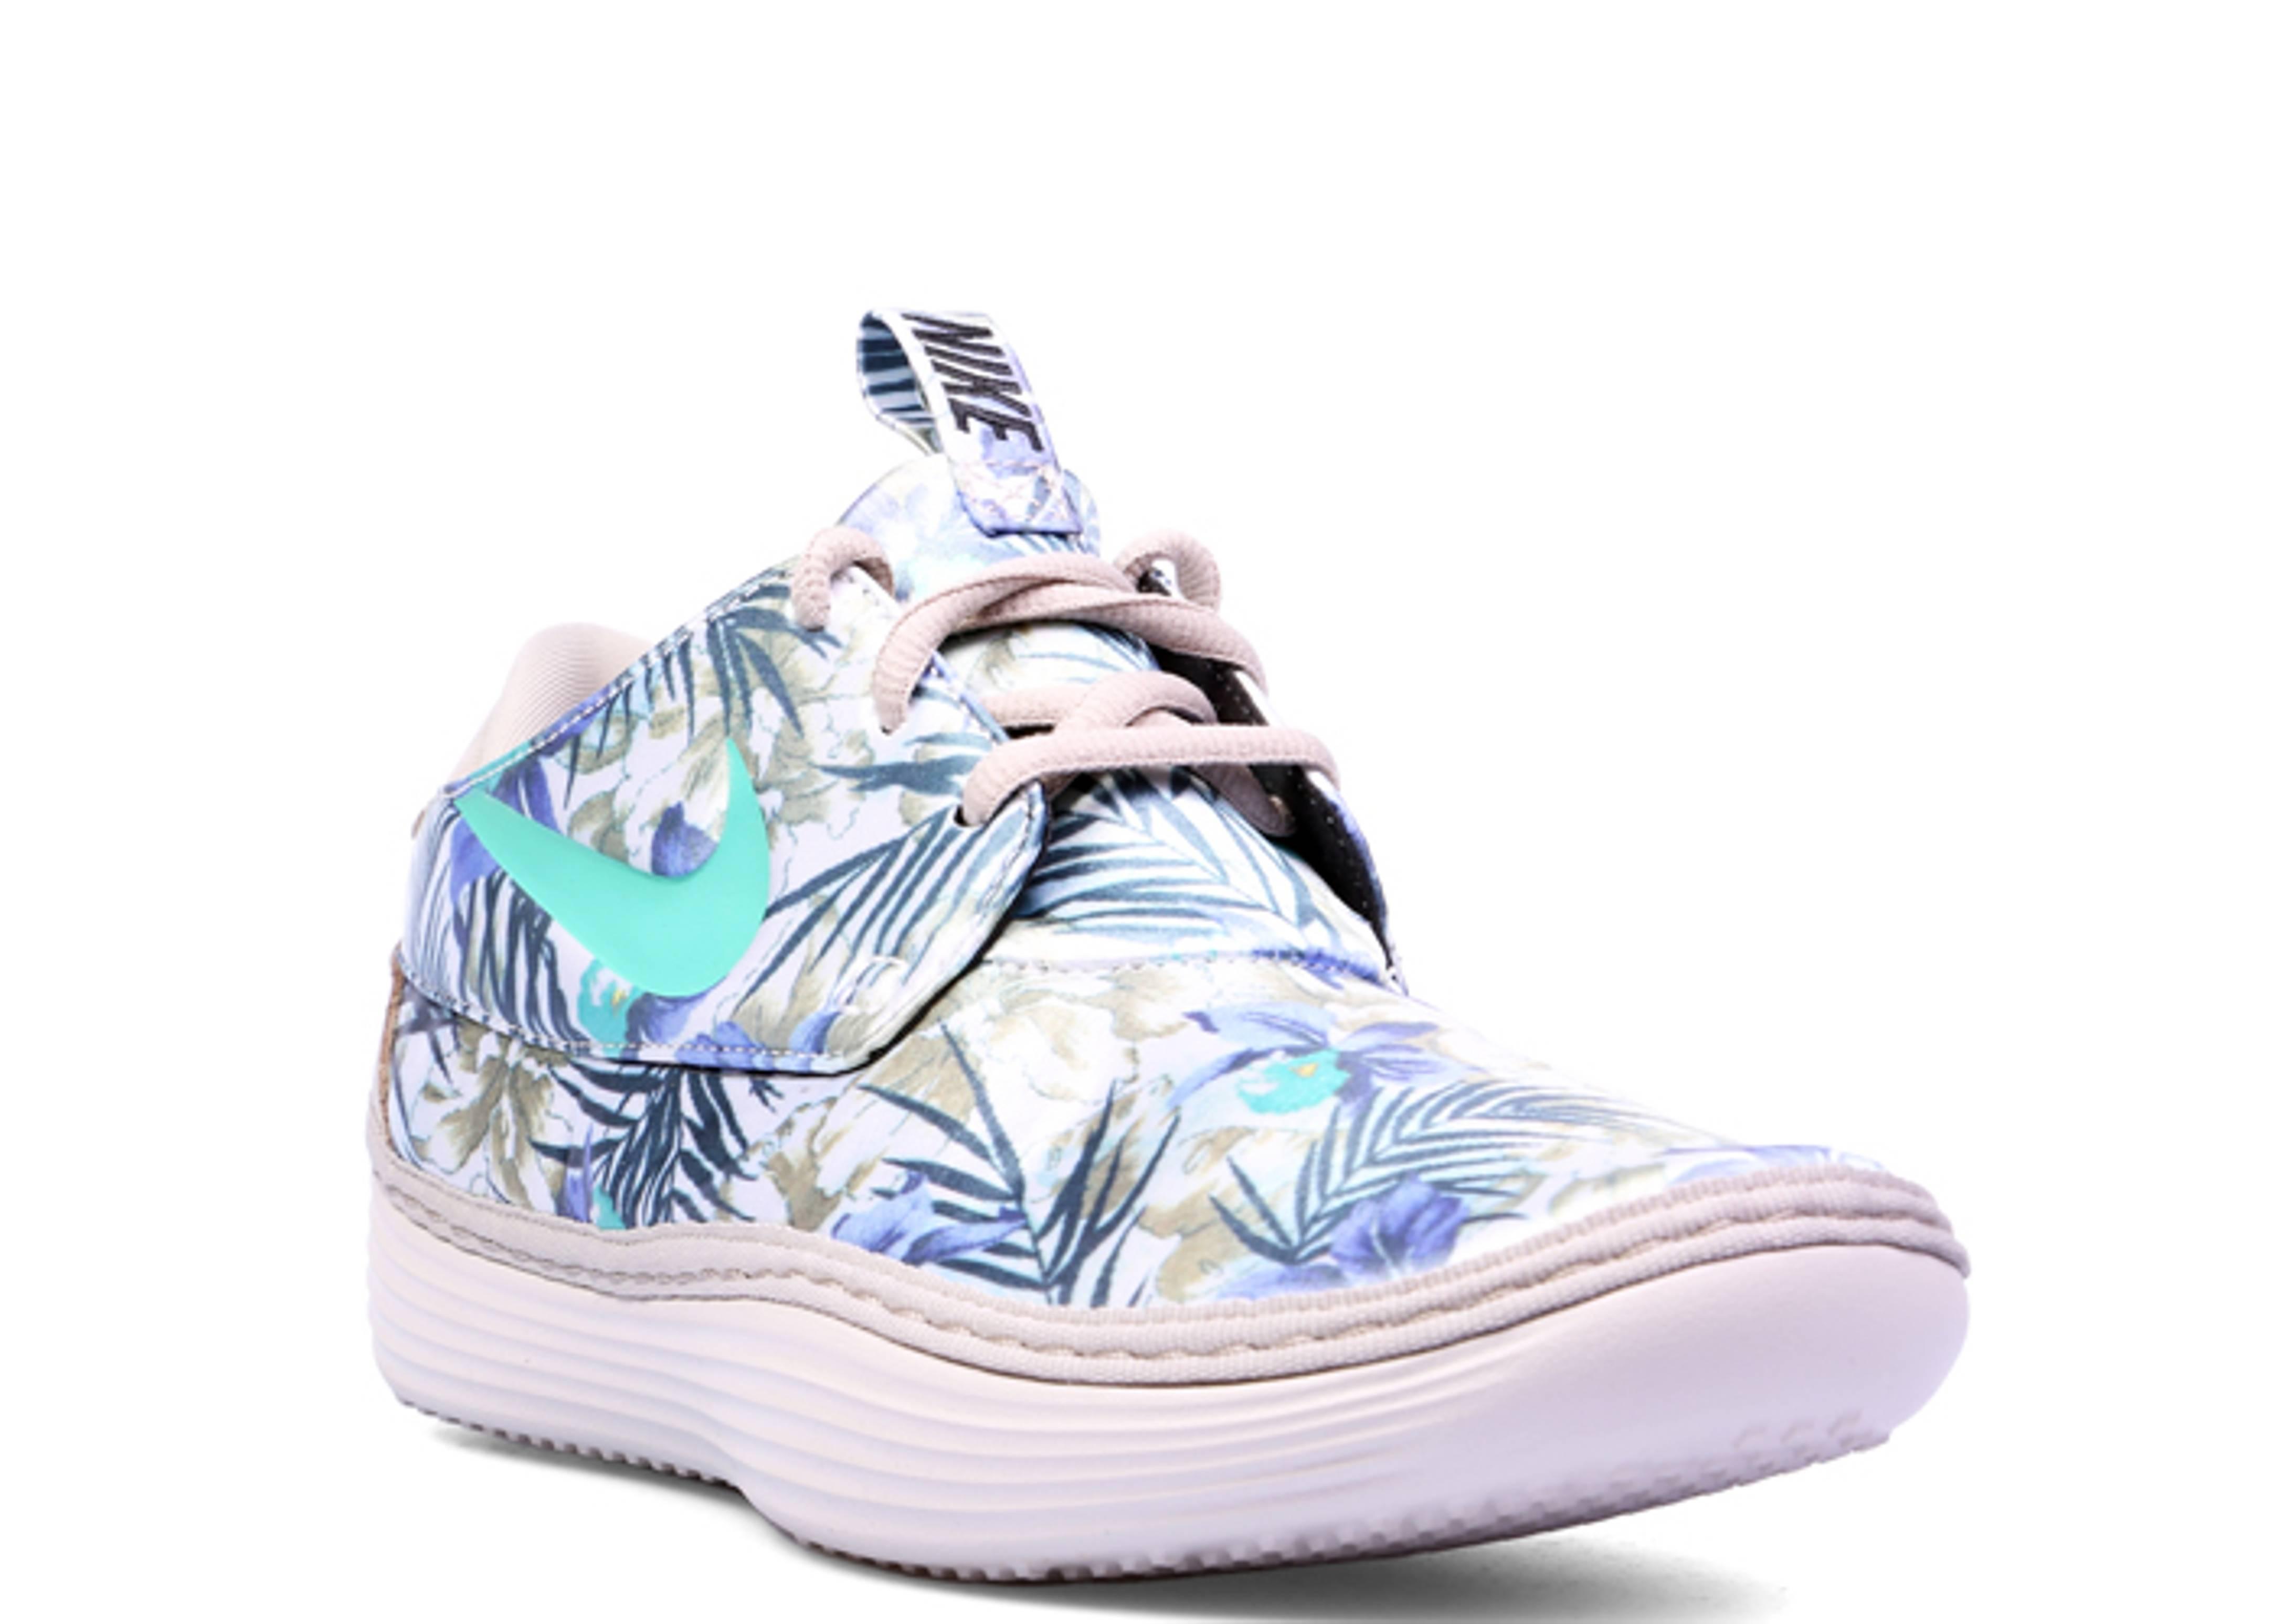 watch 006d7 39753 Ws Solarsoft Moccasin - Nike - 622268 003 - classic stonecrystal mint   Flight Club